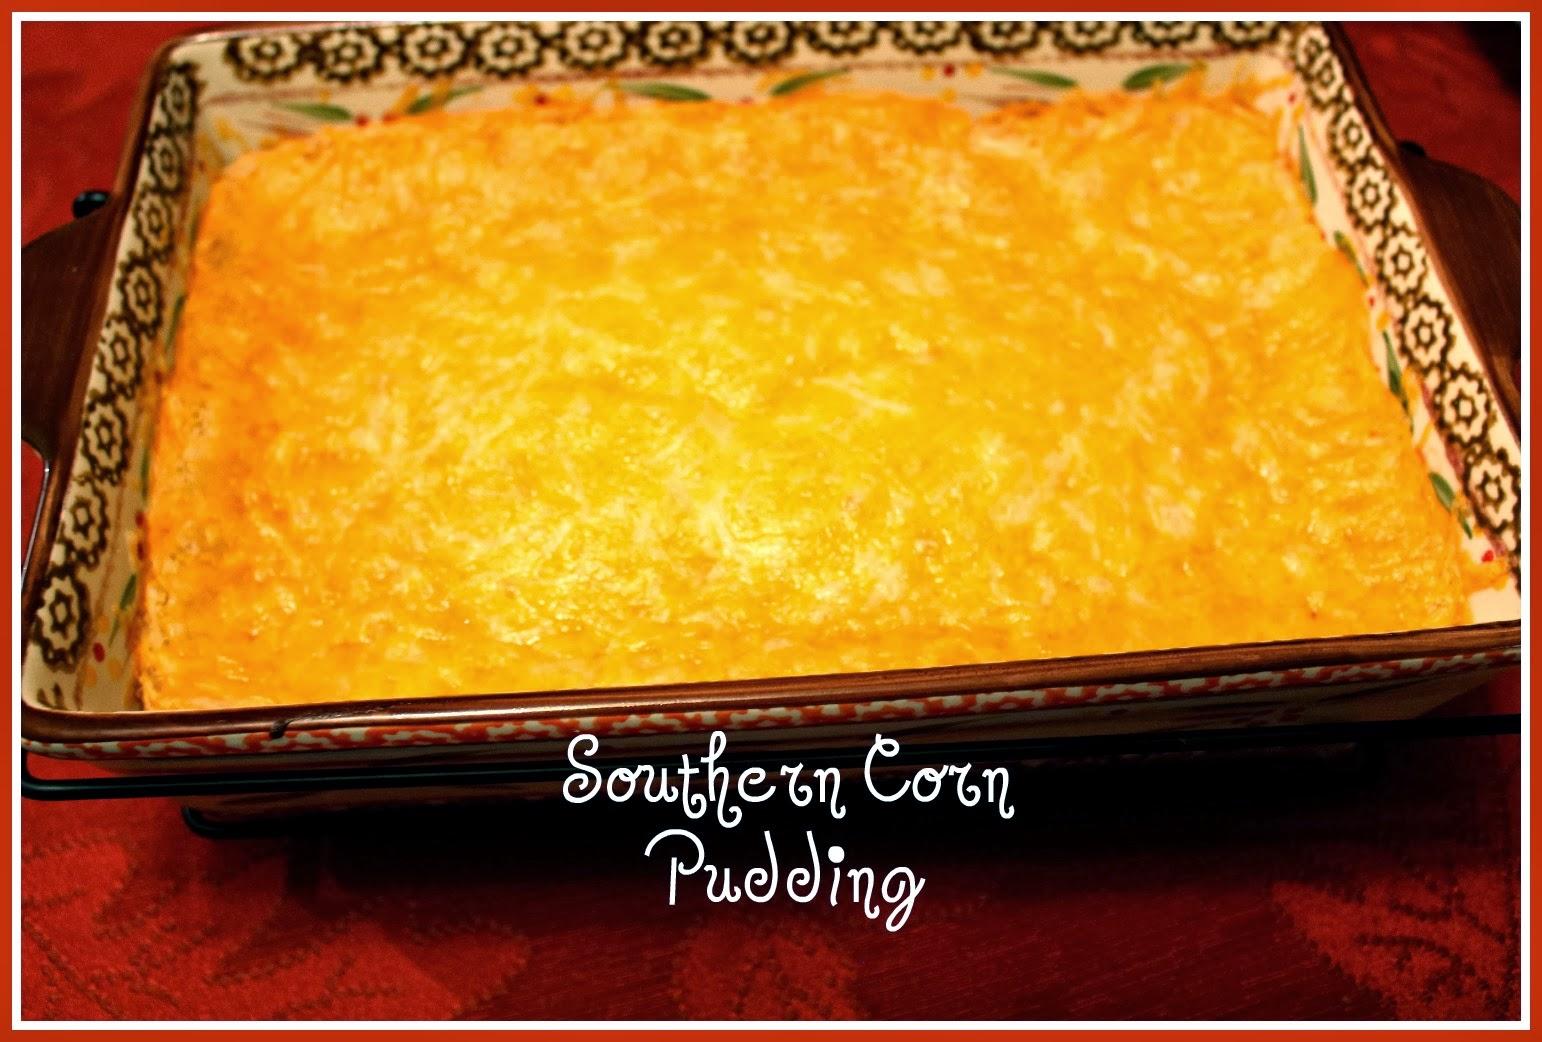 Sweet Tea and Cornbread: Kathy's Southern Corn Pudding!